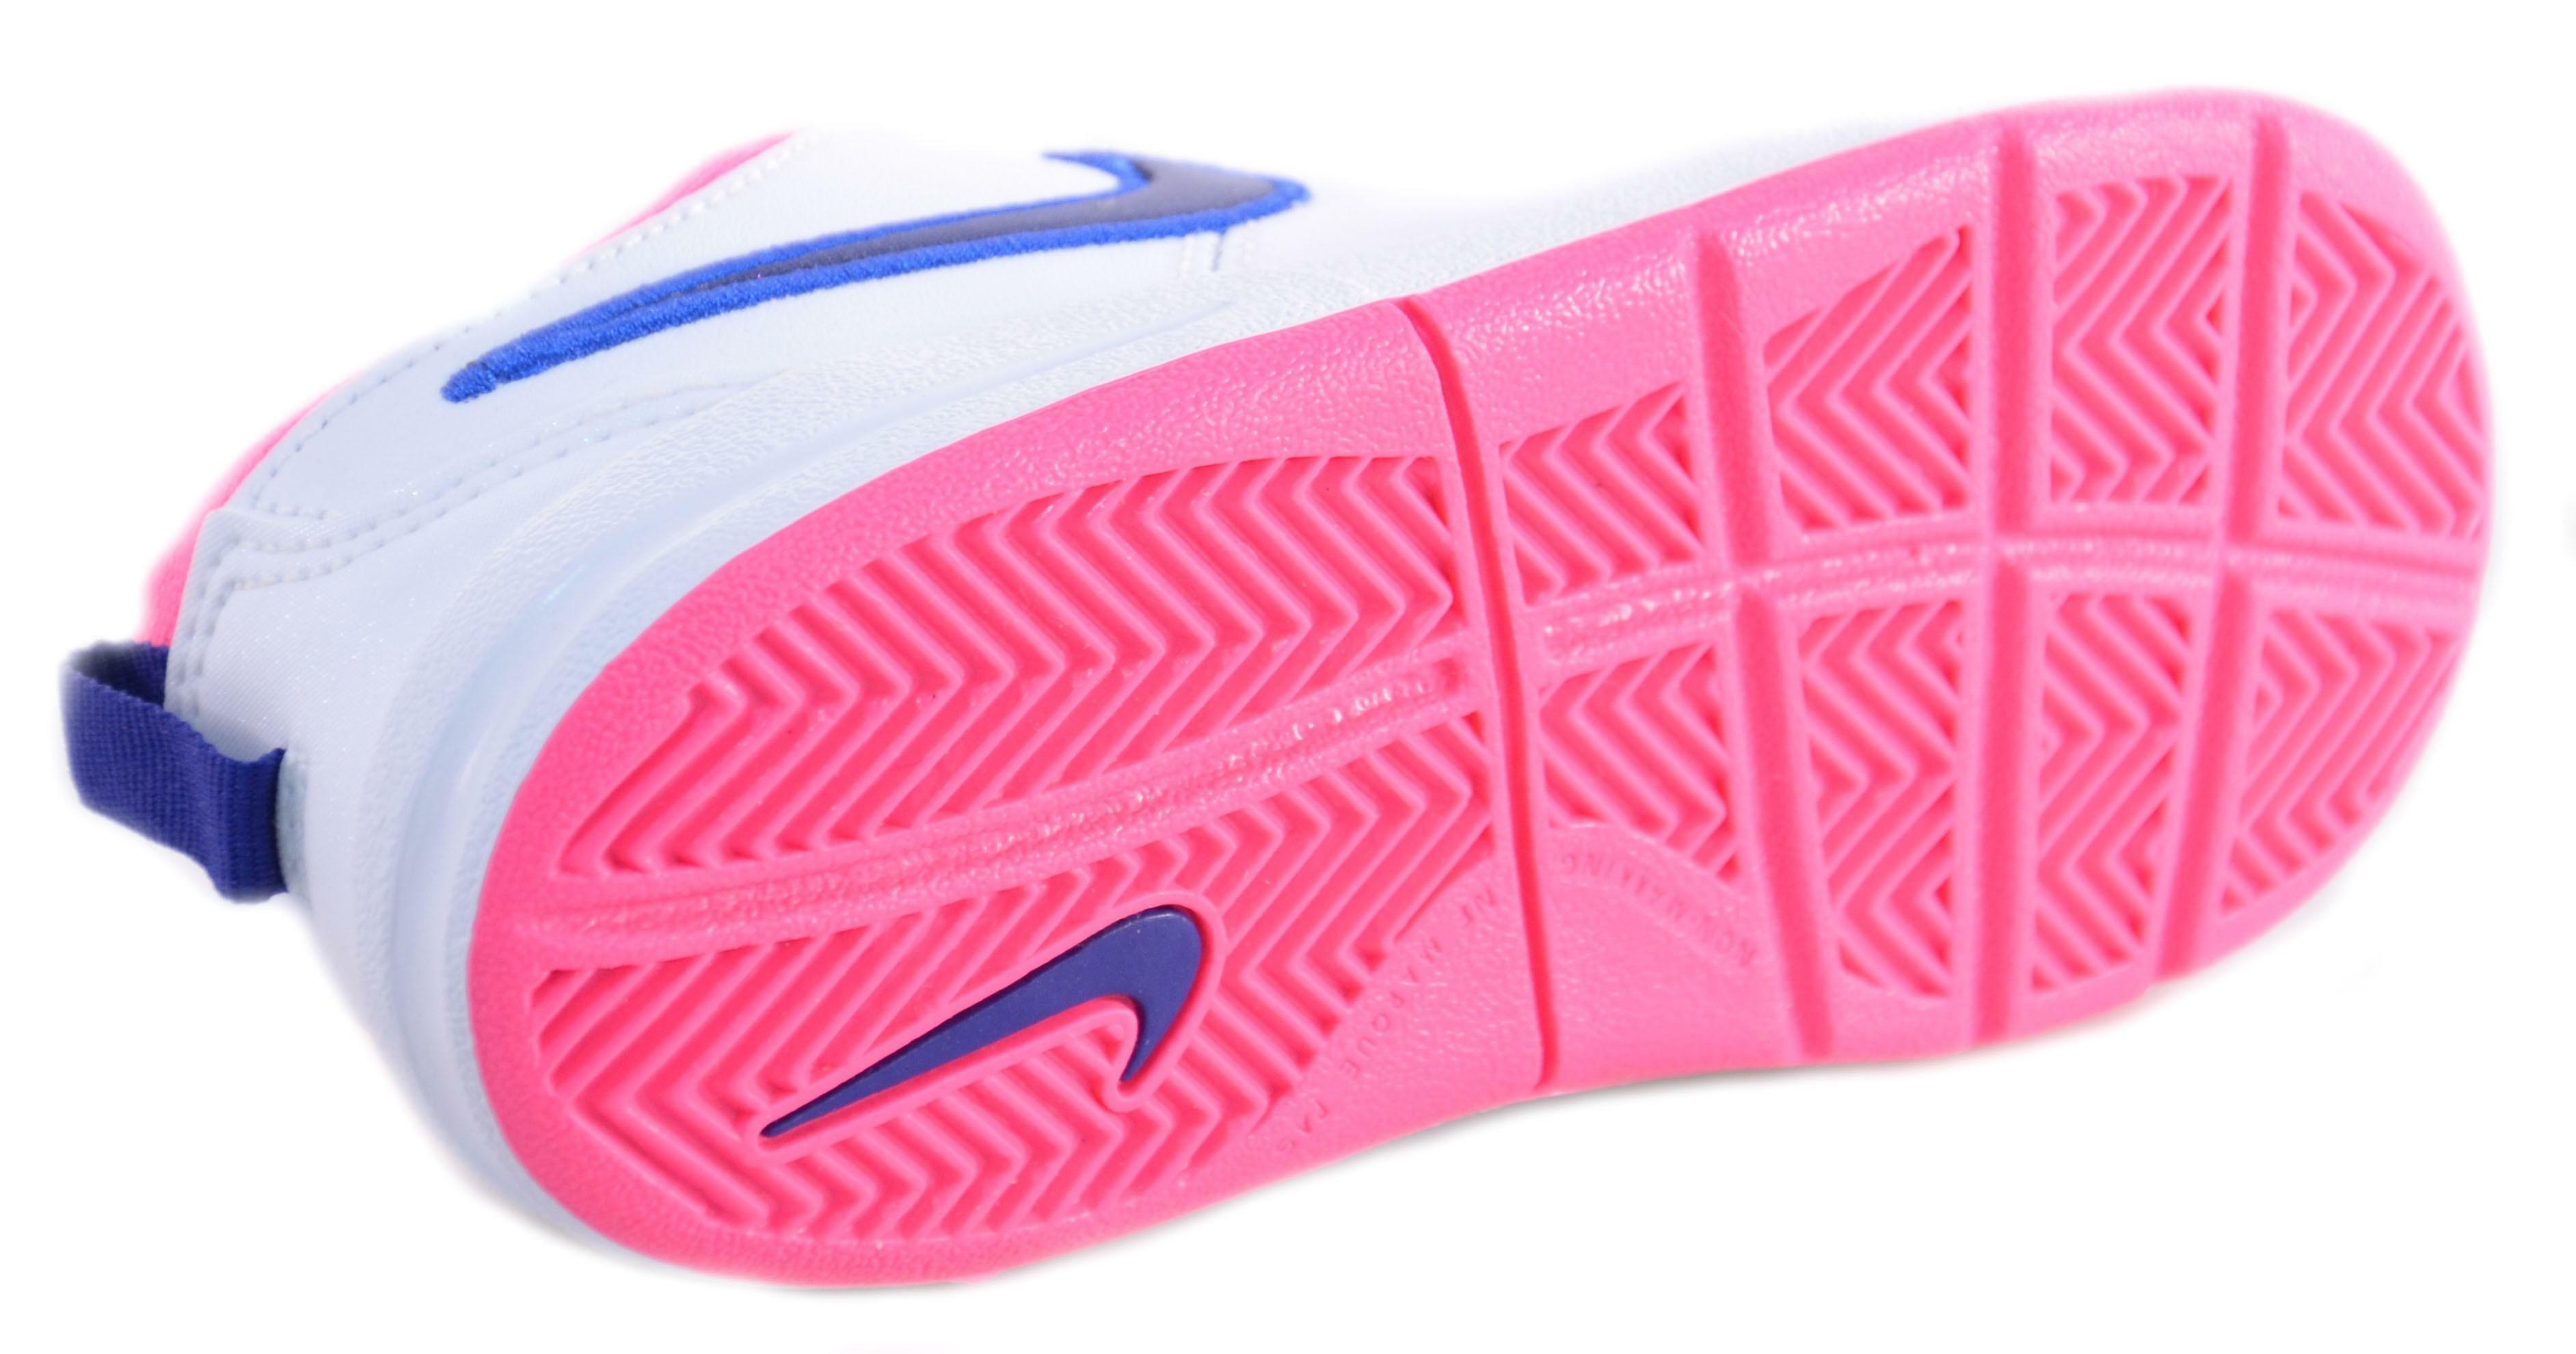 Nike pico 4 (psv) scarpe bambina bianche blu rosa pelle velcro 454477